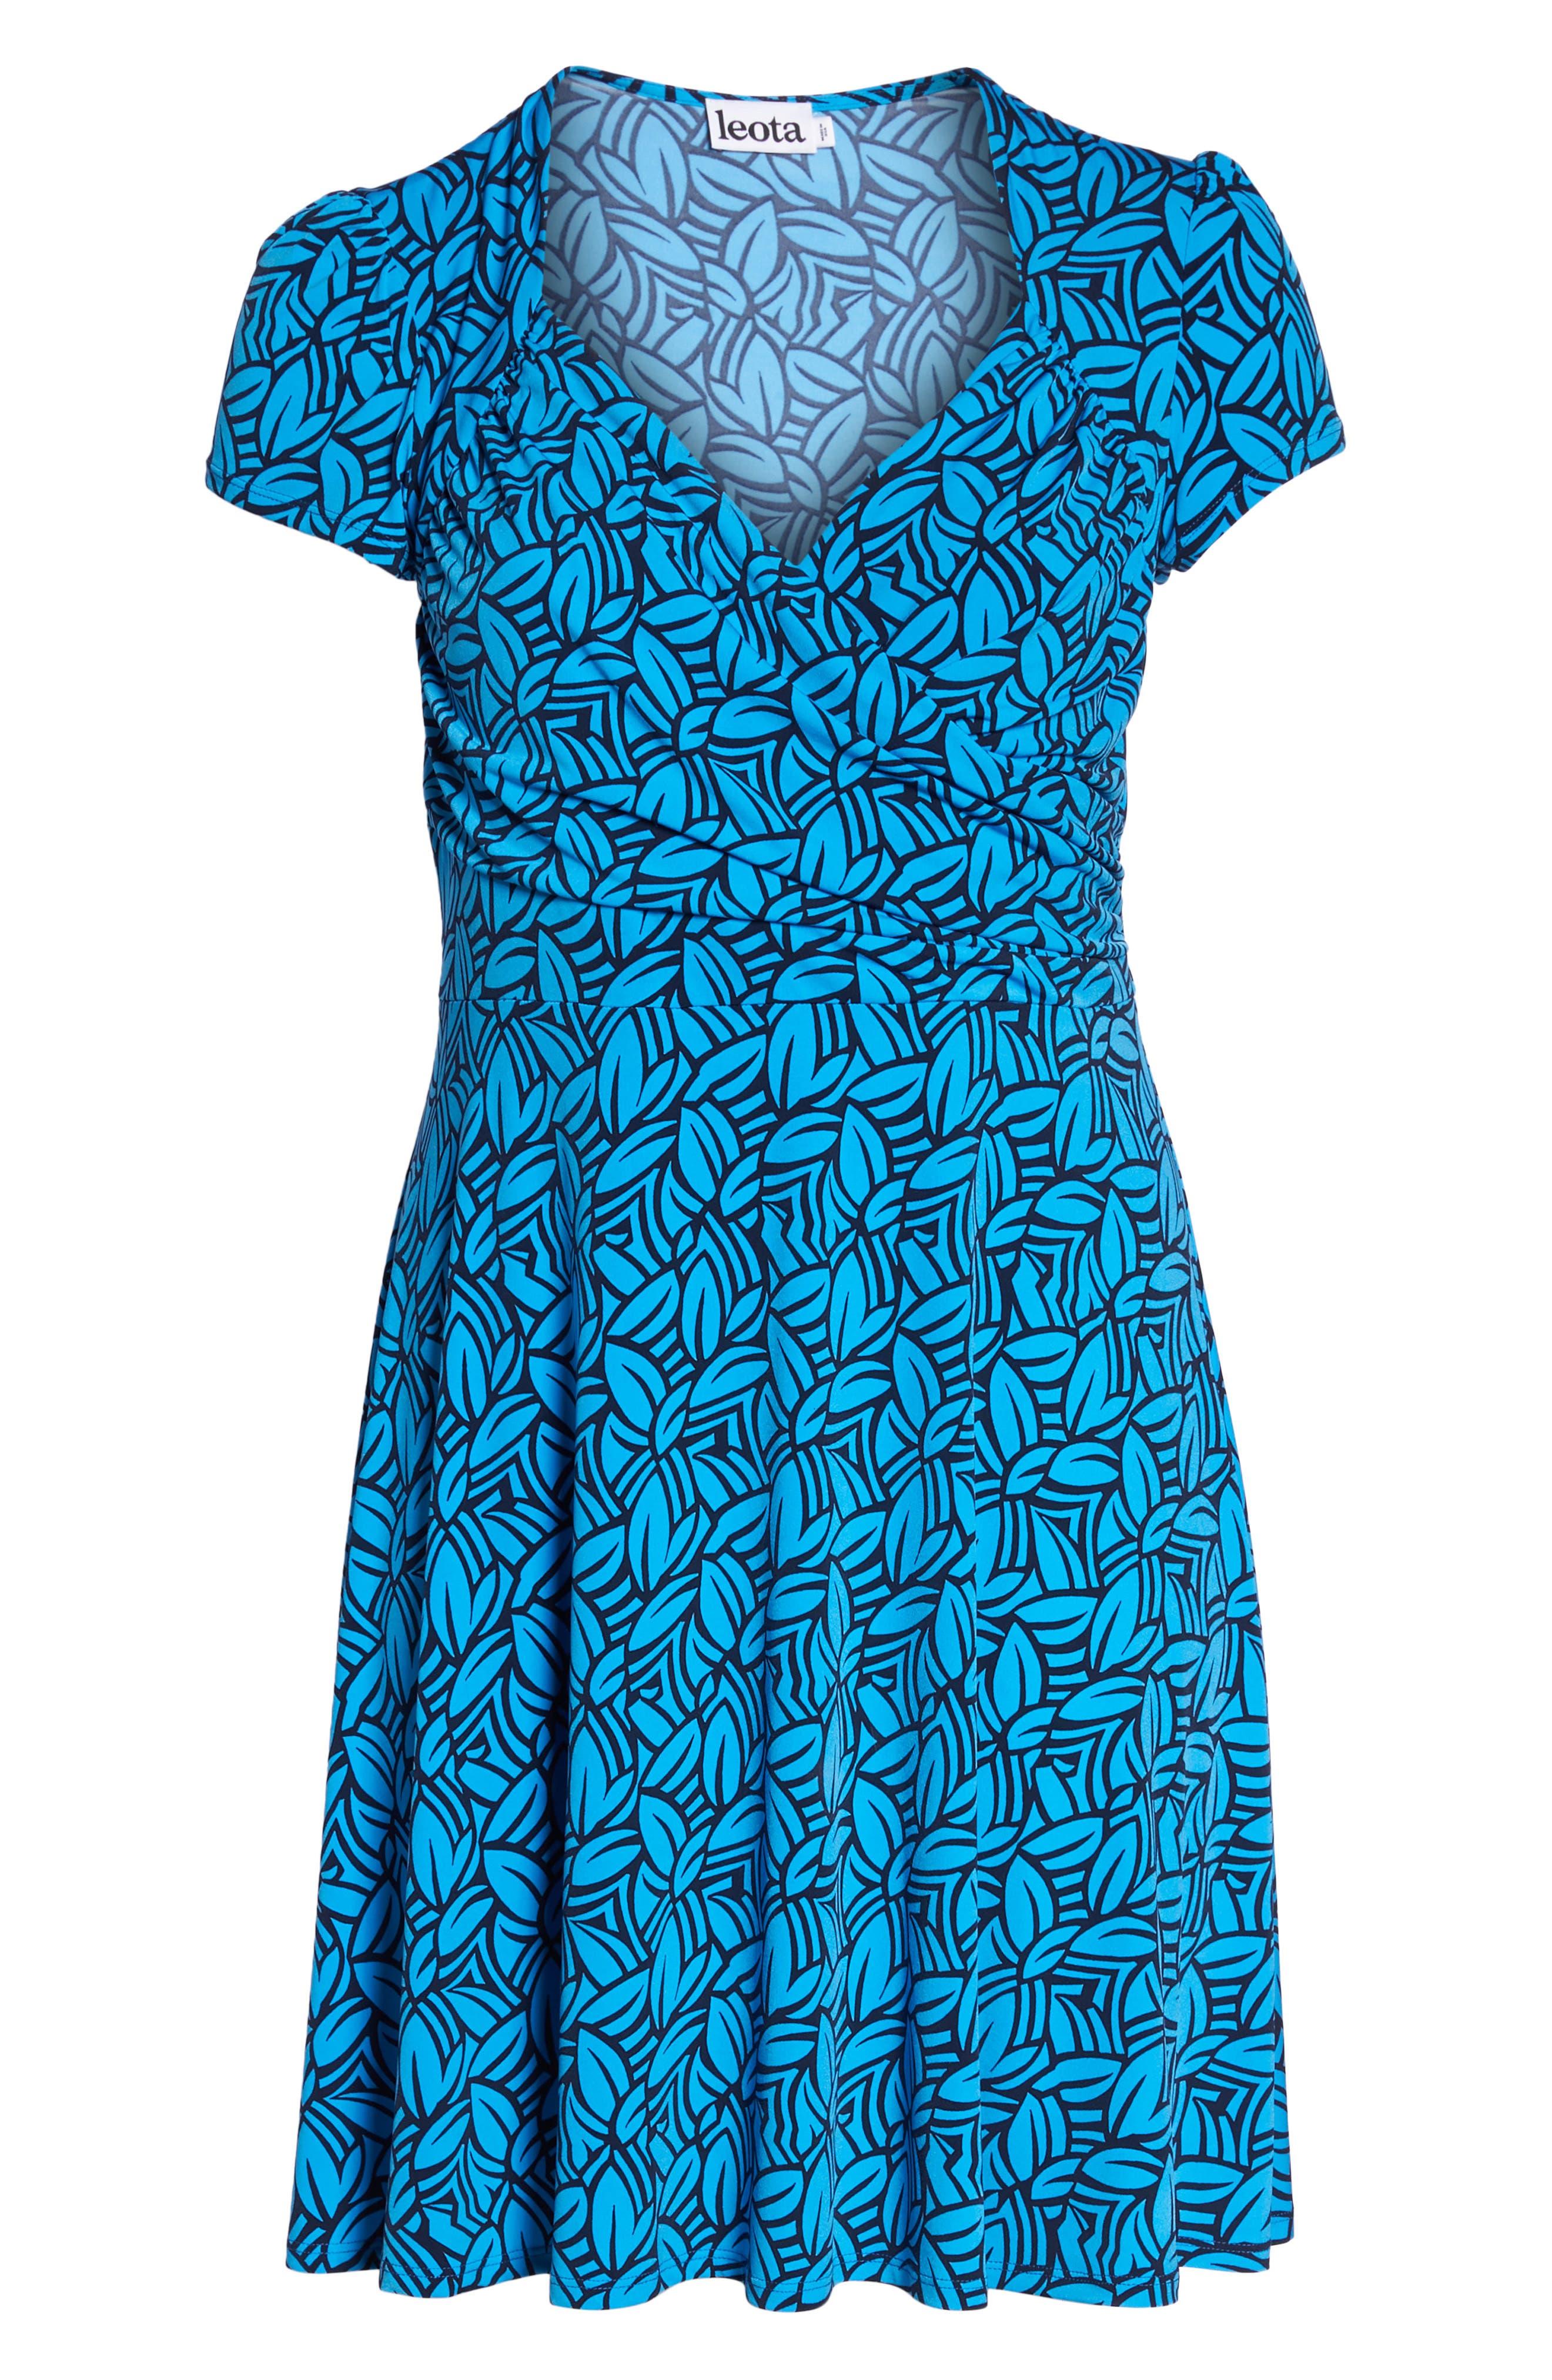 Faux Wrap Jersey Dress,                             Alternate thumbnail 7, color,                             FORGE BLITHE